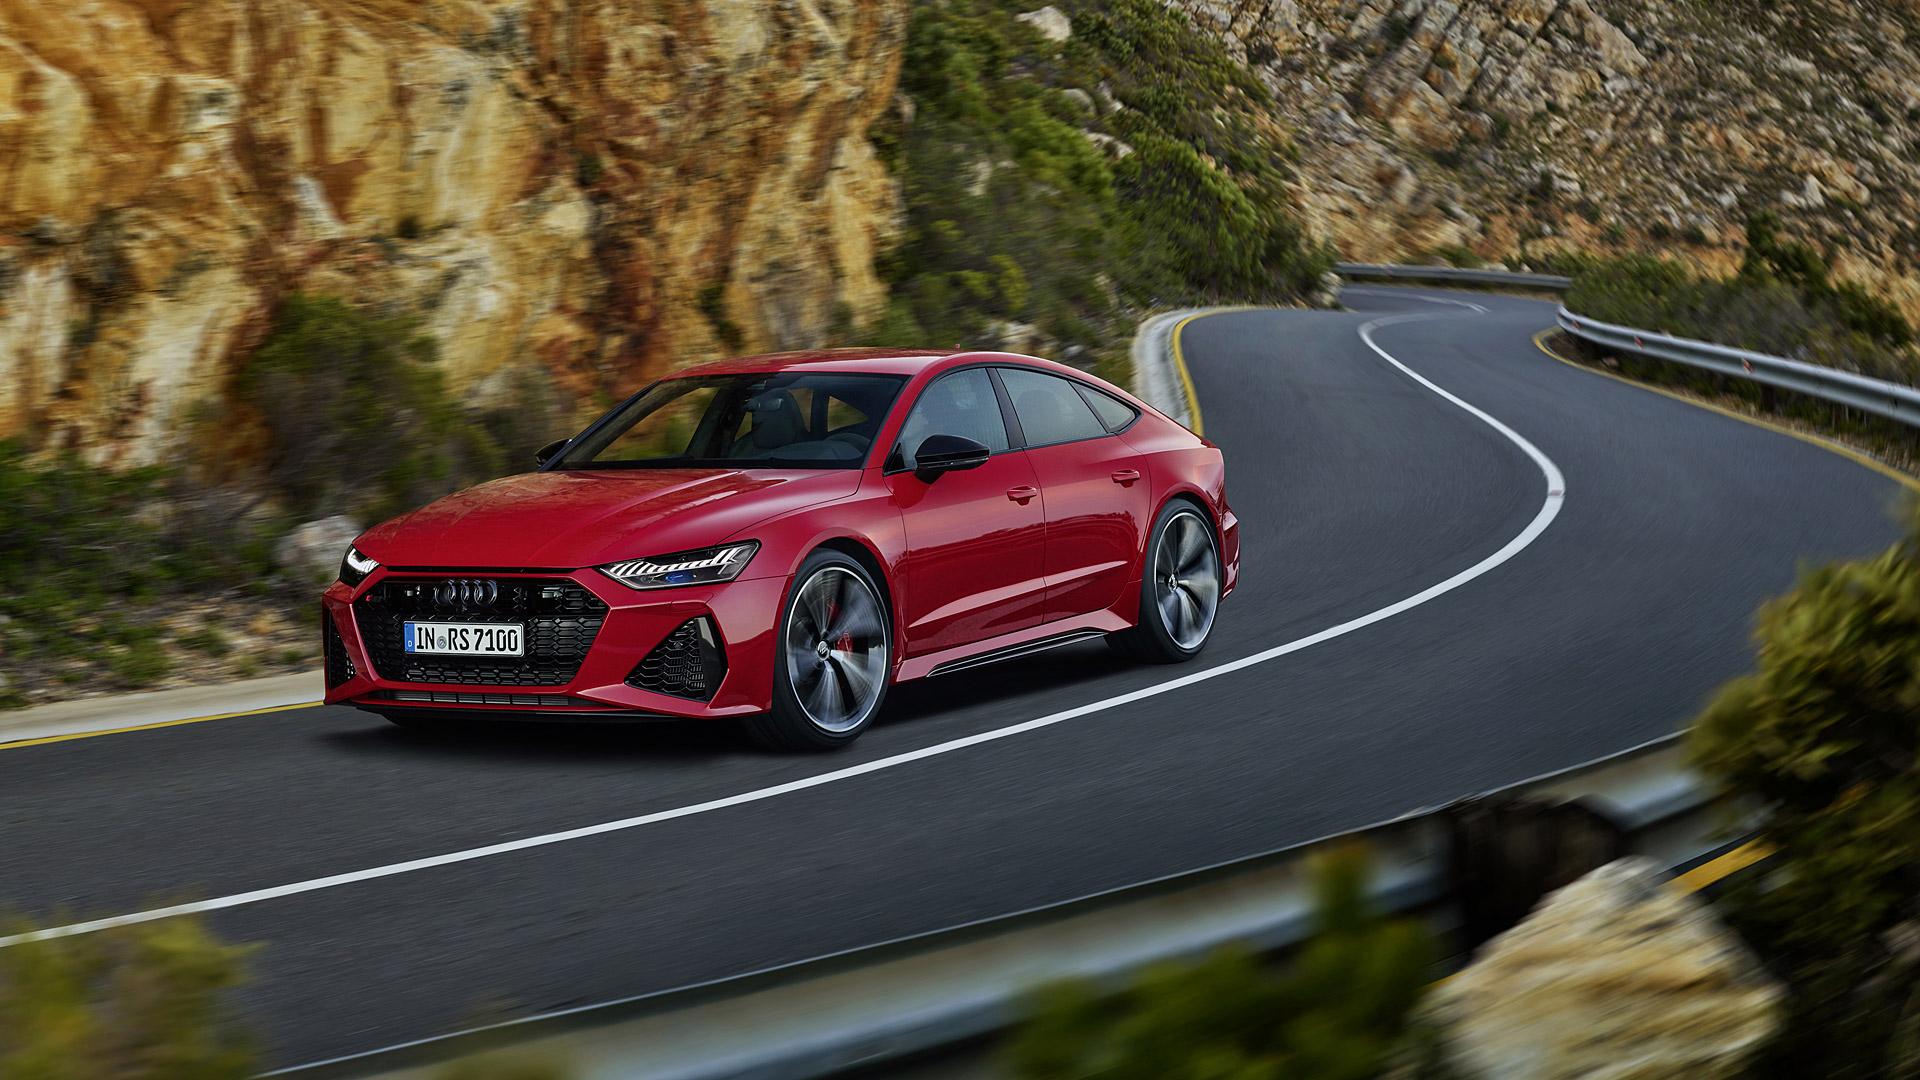 Audi Rs7 Sportback 2020 1920x1080 Wallpaper Teahub Io